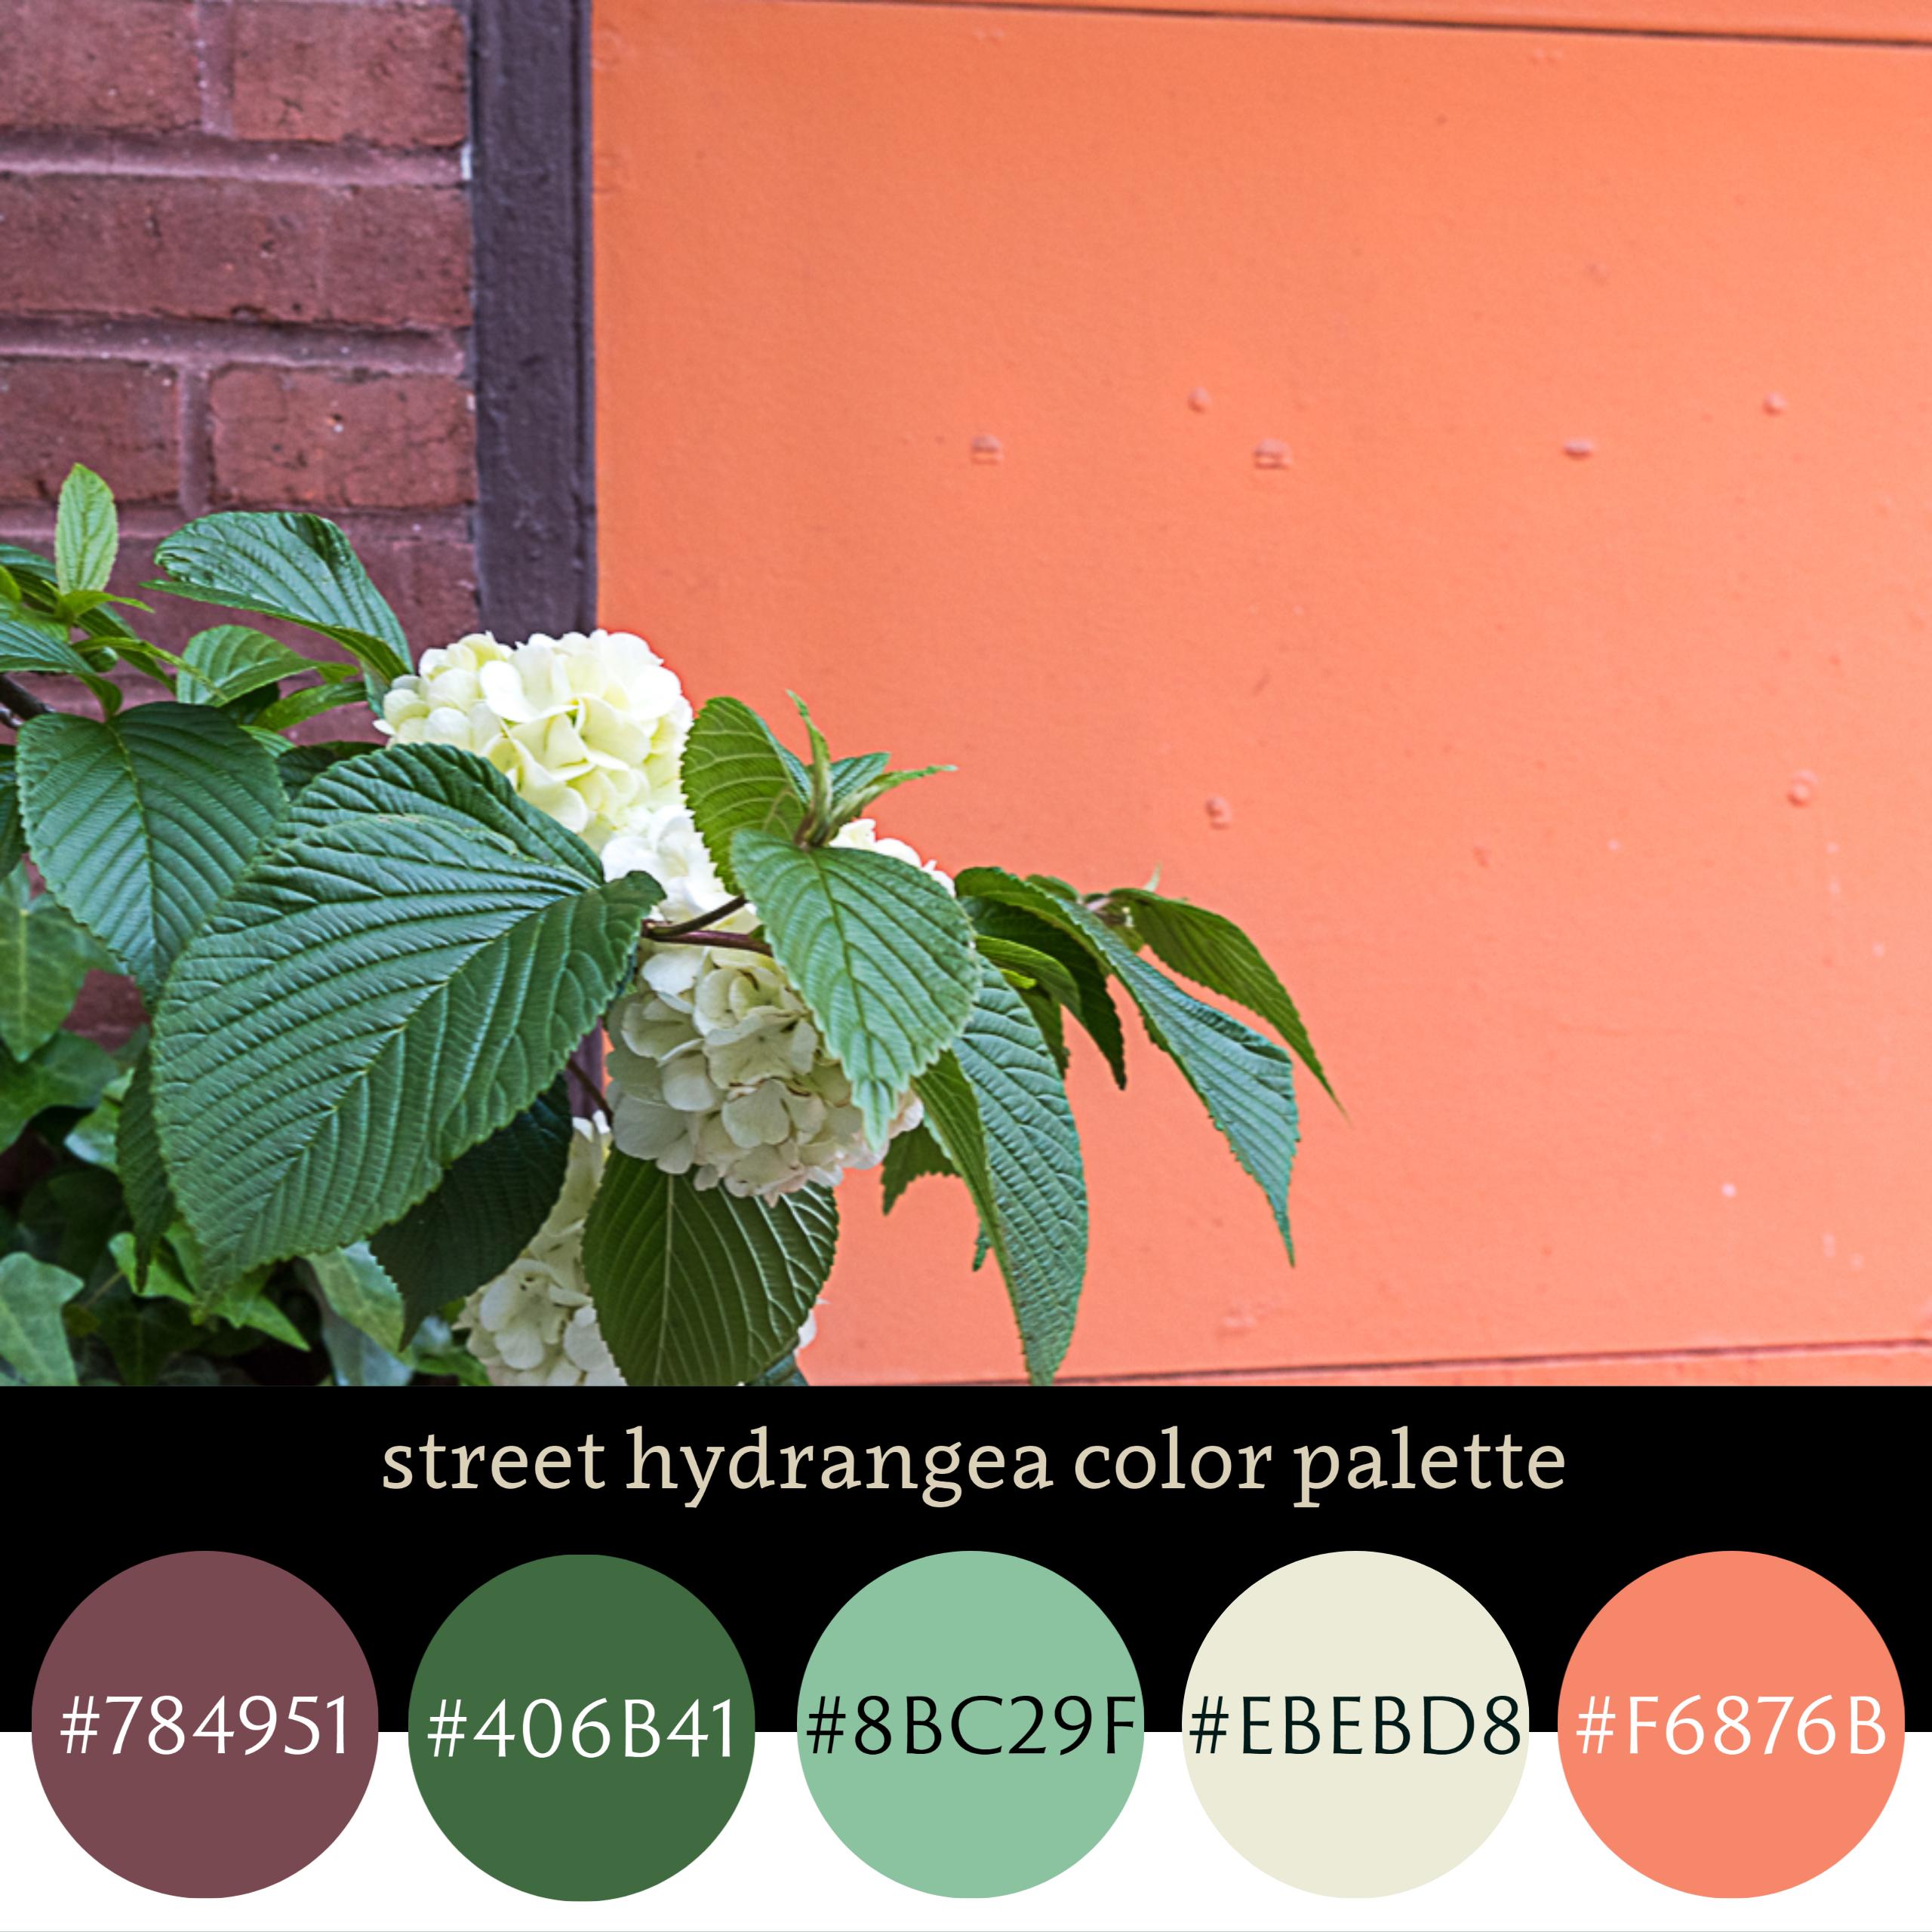 Street Hydrangea Color Palette